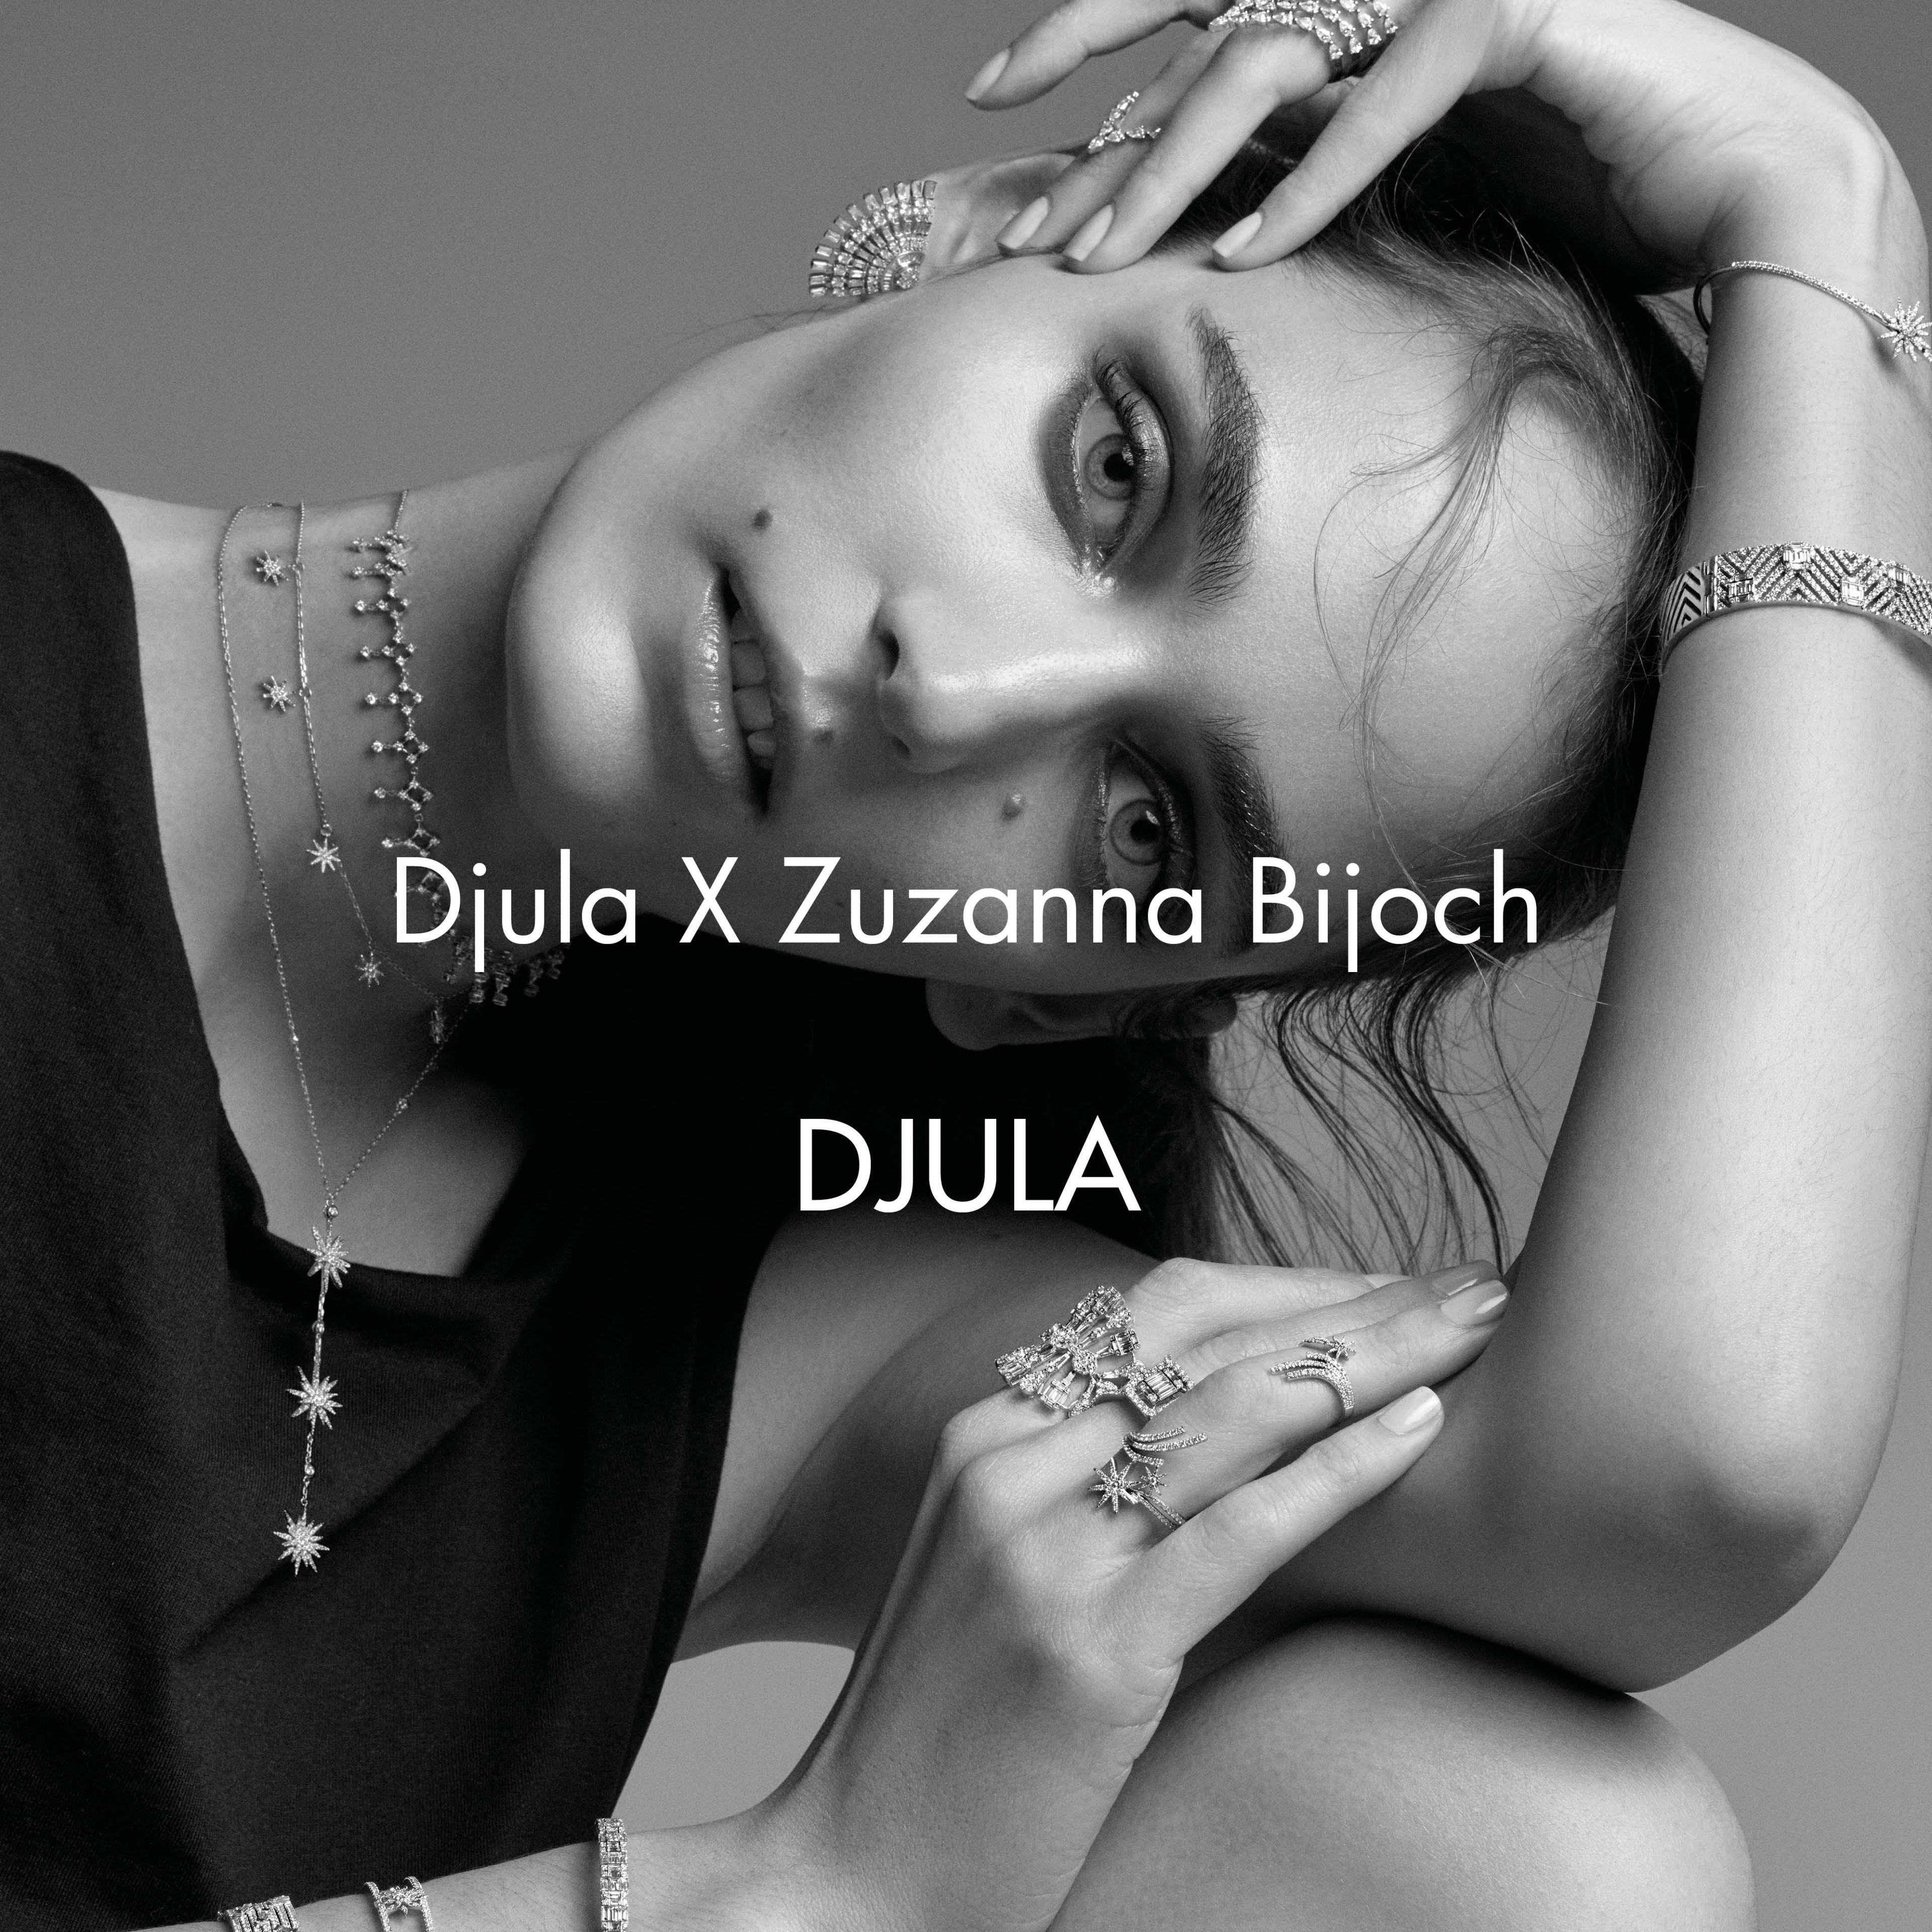 DJULA X ZUZANNA BIJOCH